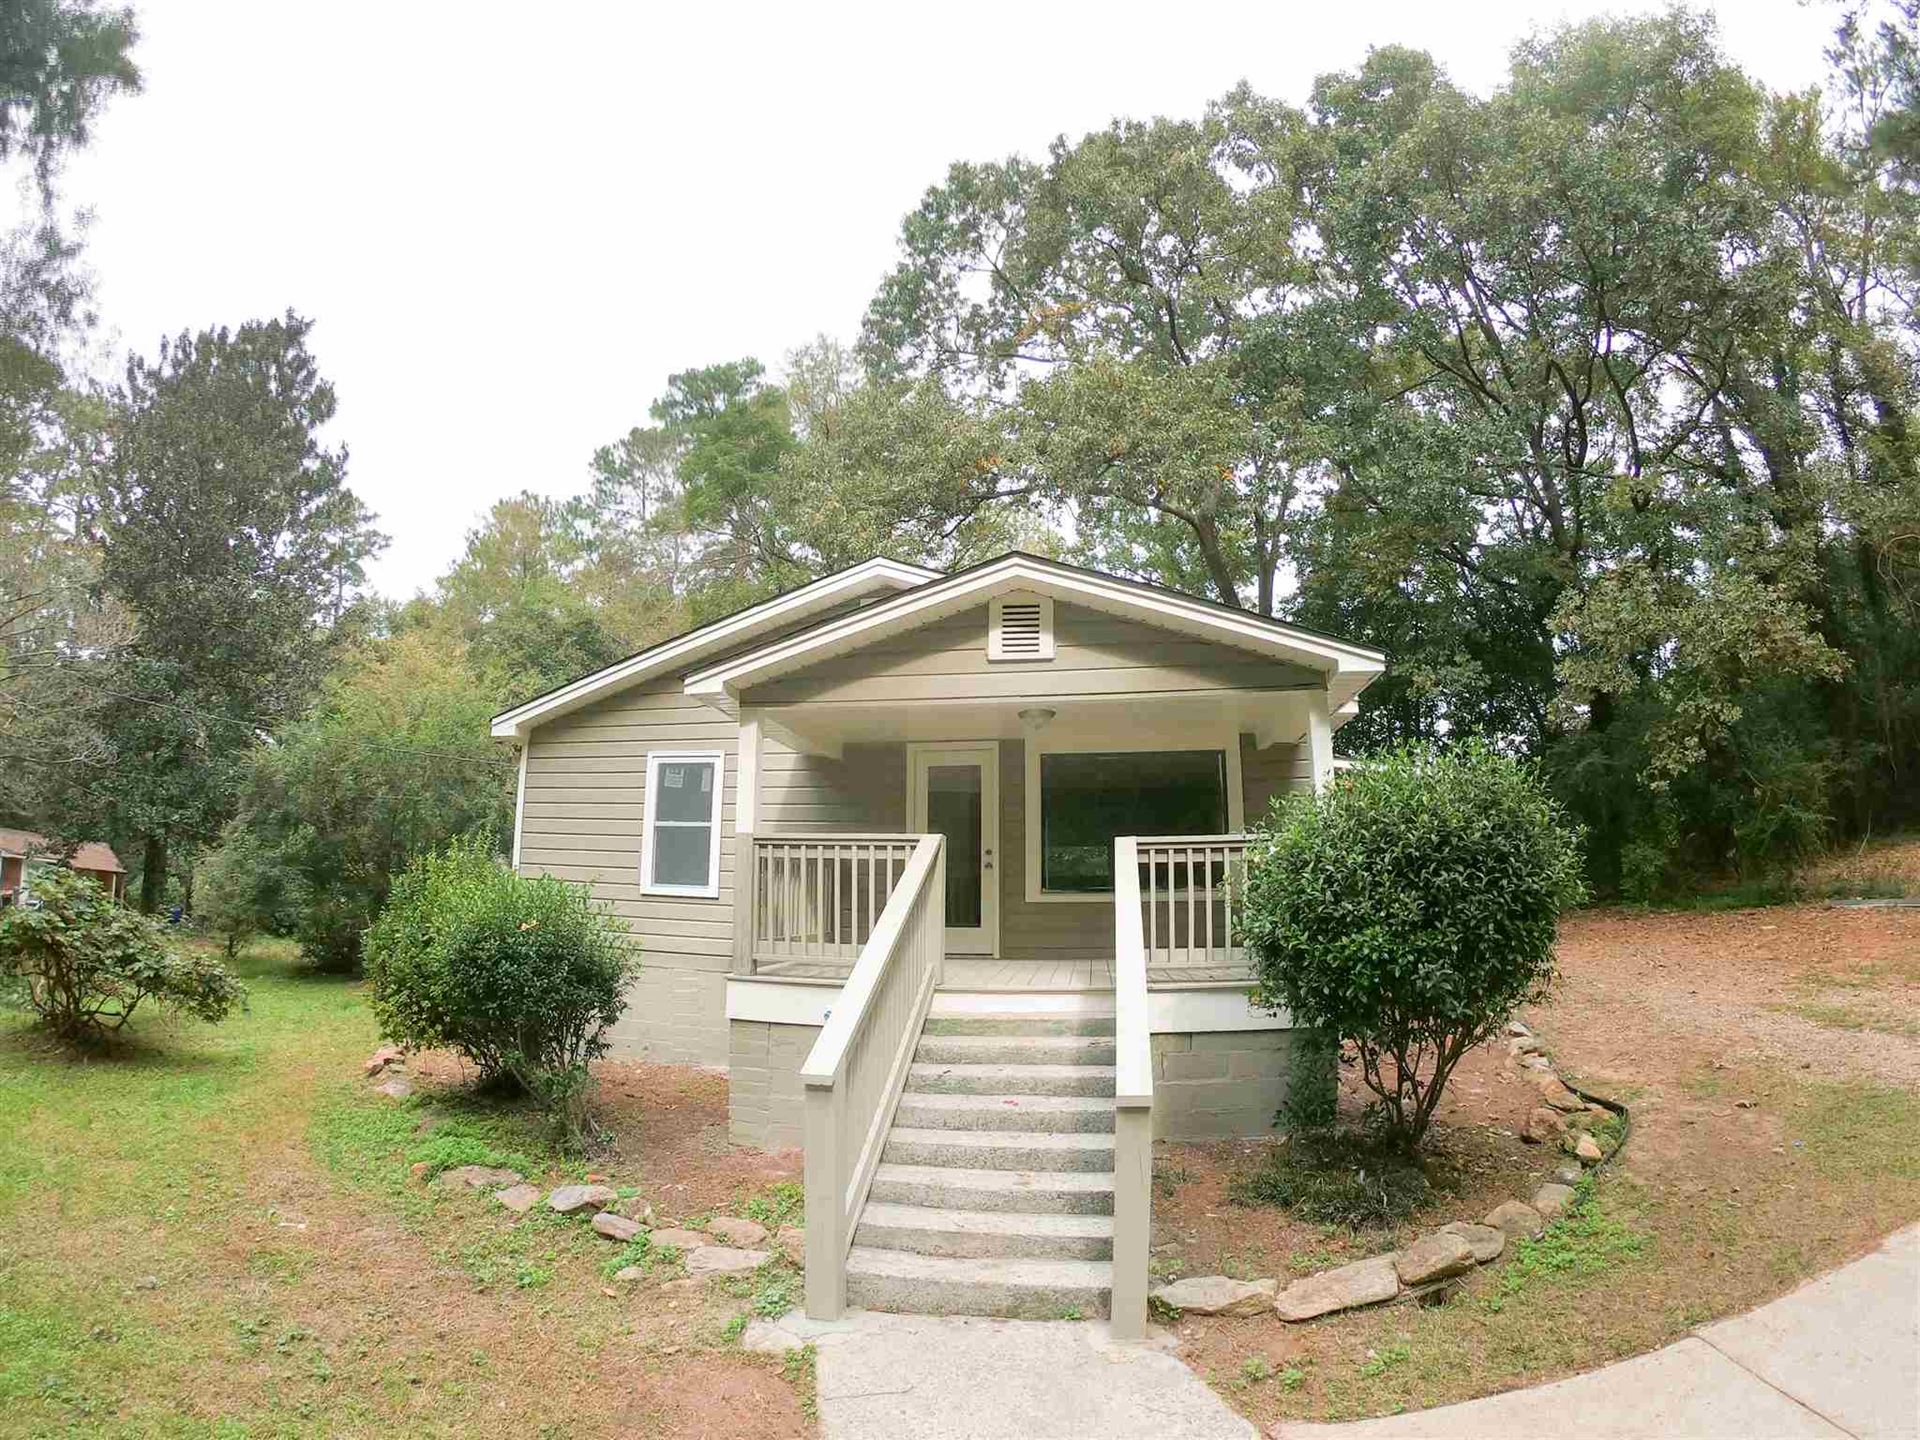 155 Johnson Dr Ext, Athens, GA 30605 - MLS#: 8878737